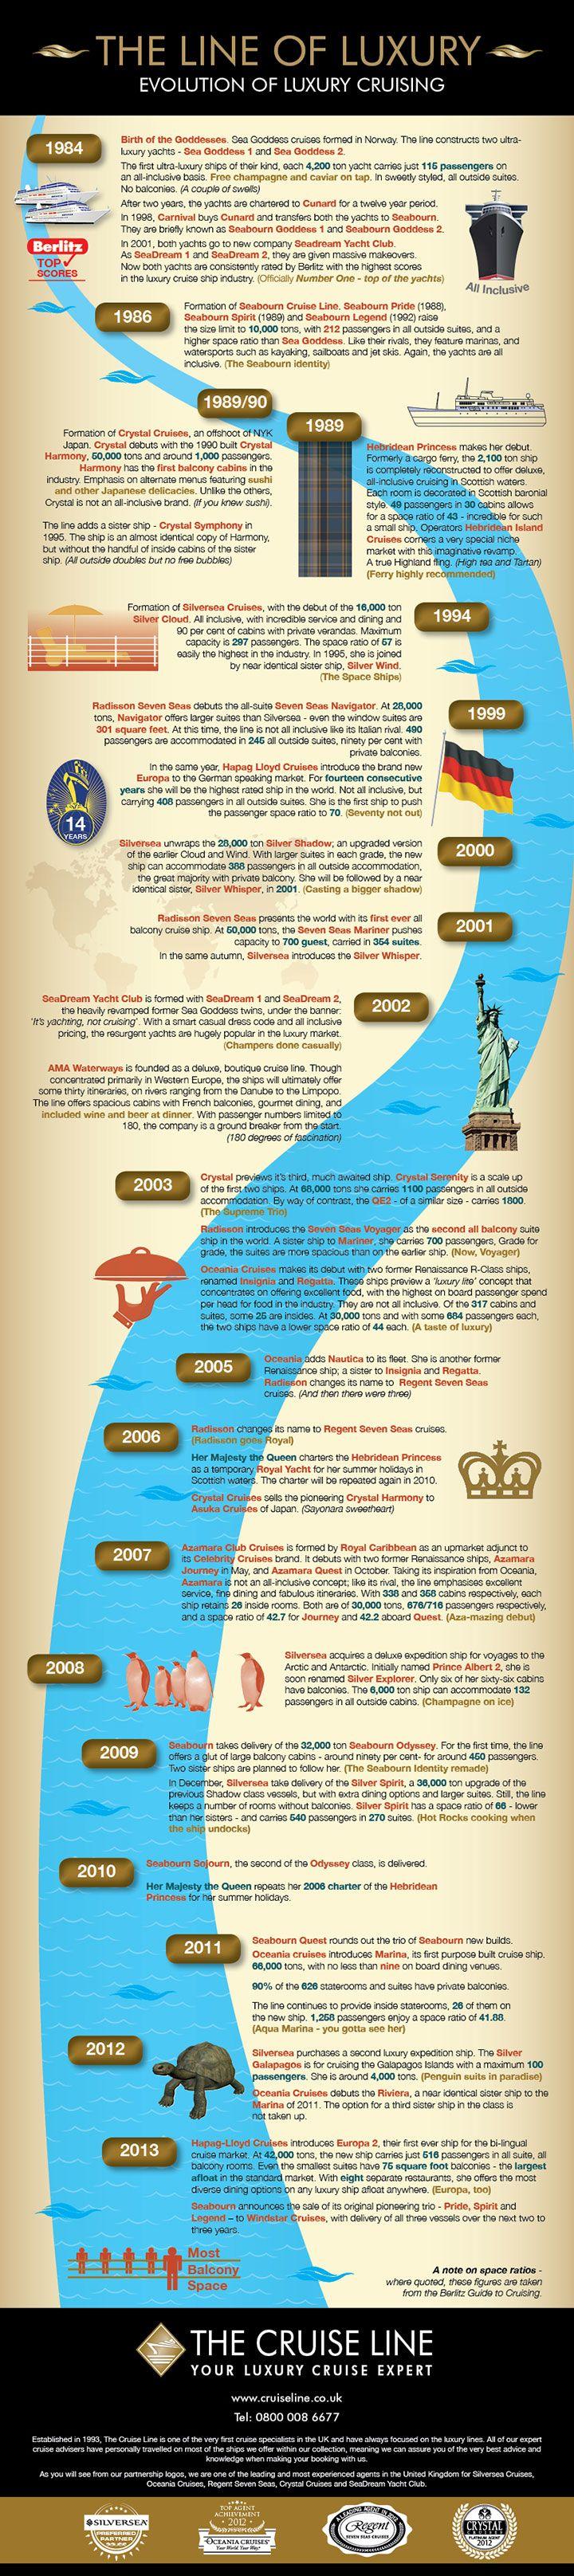 The Evolution of Luxury Cruising - Luxury Cruise Infographic